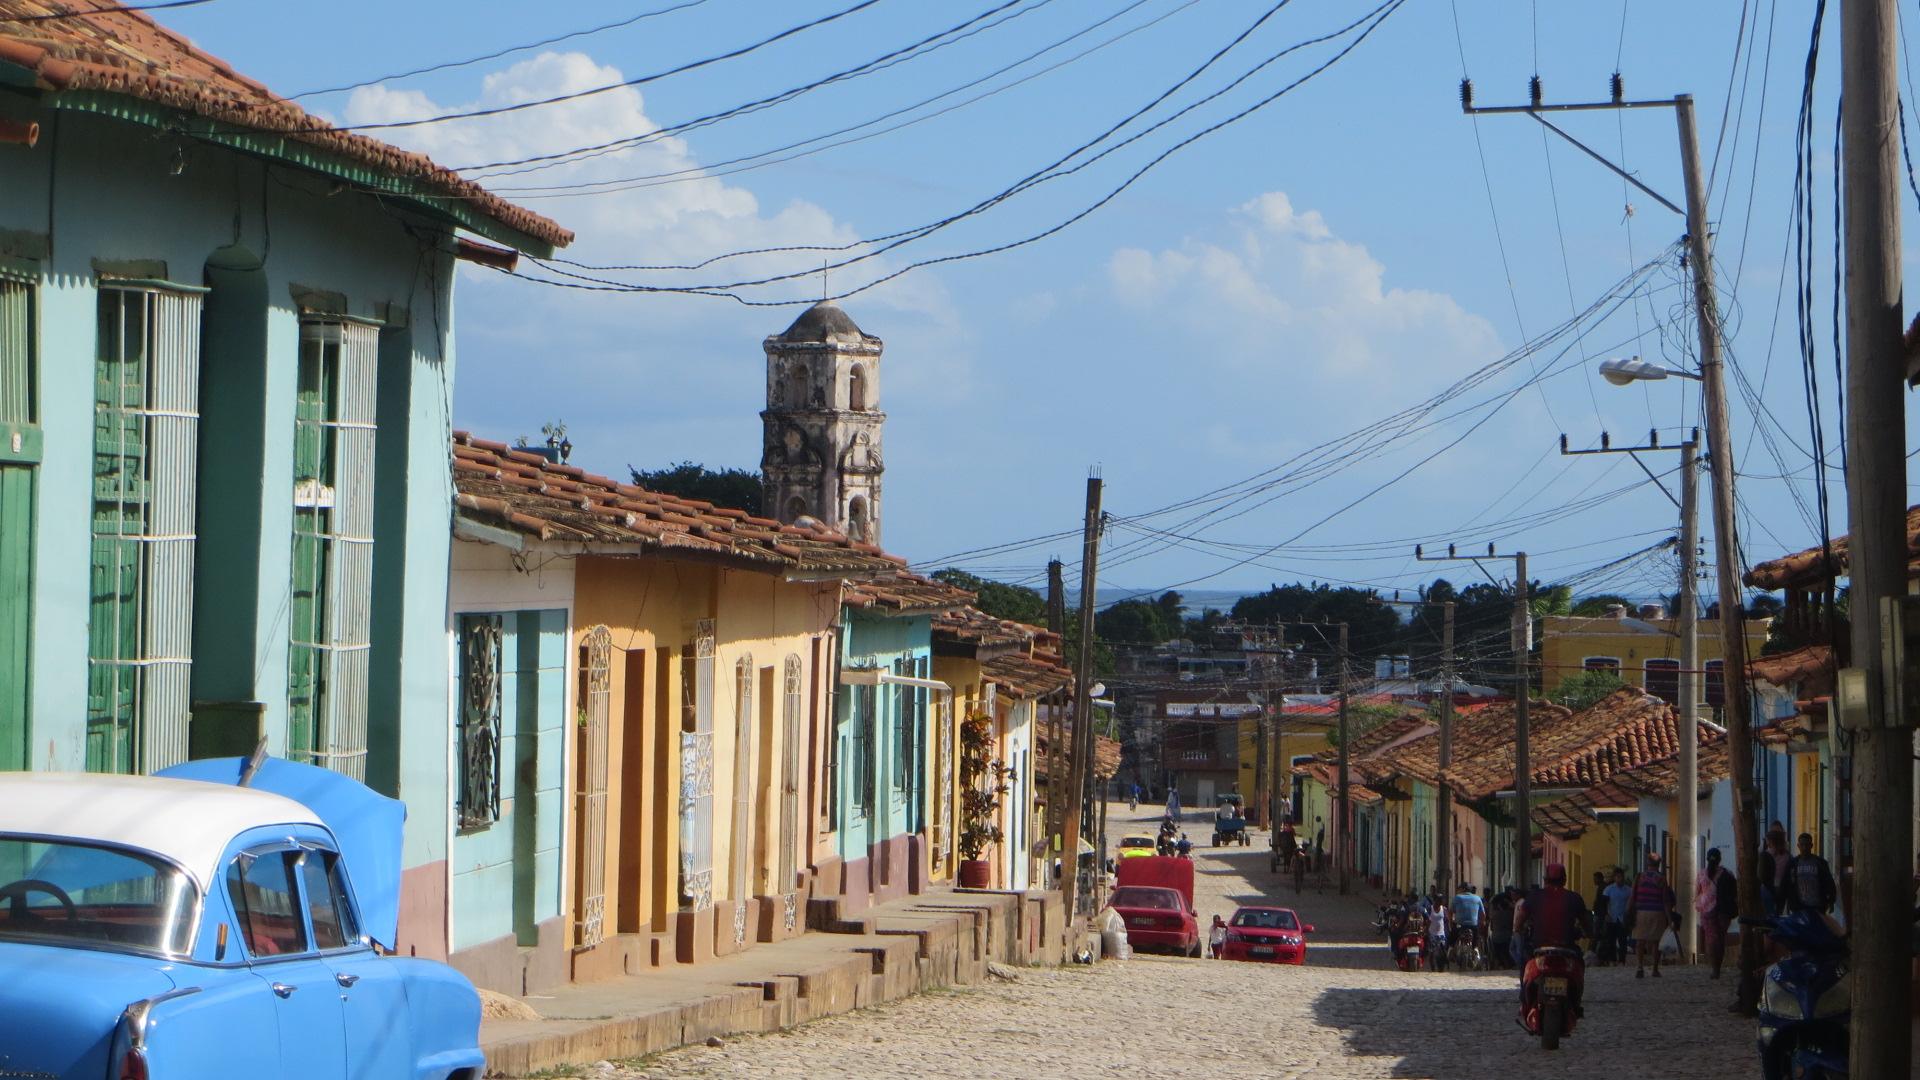 Kuba Trinidad IMG_1625